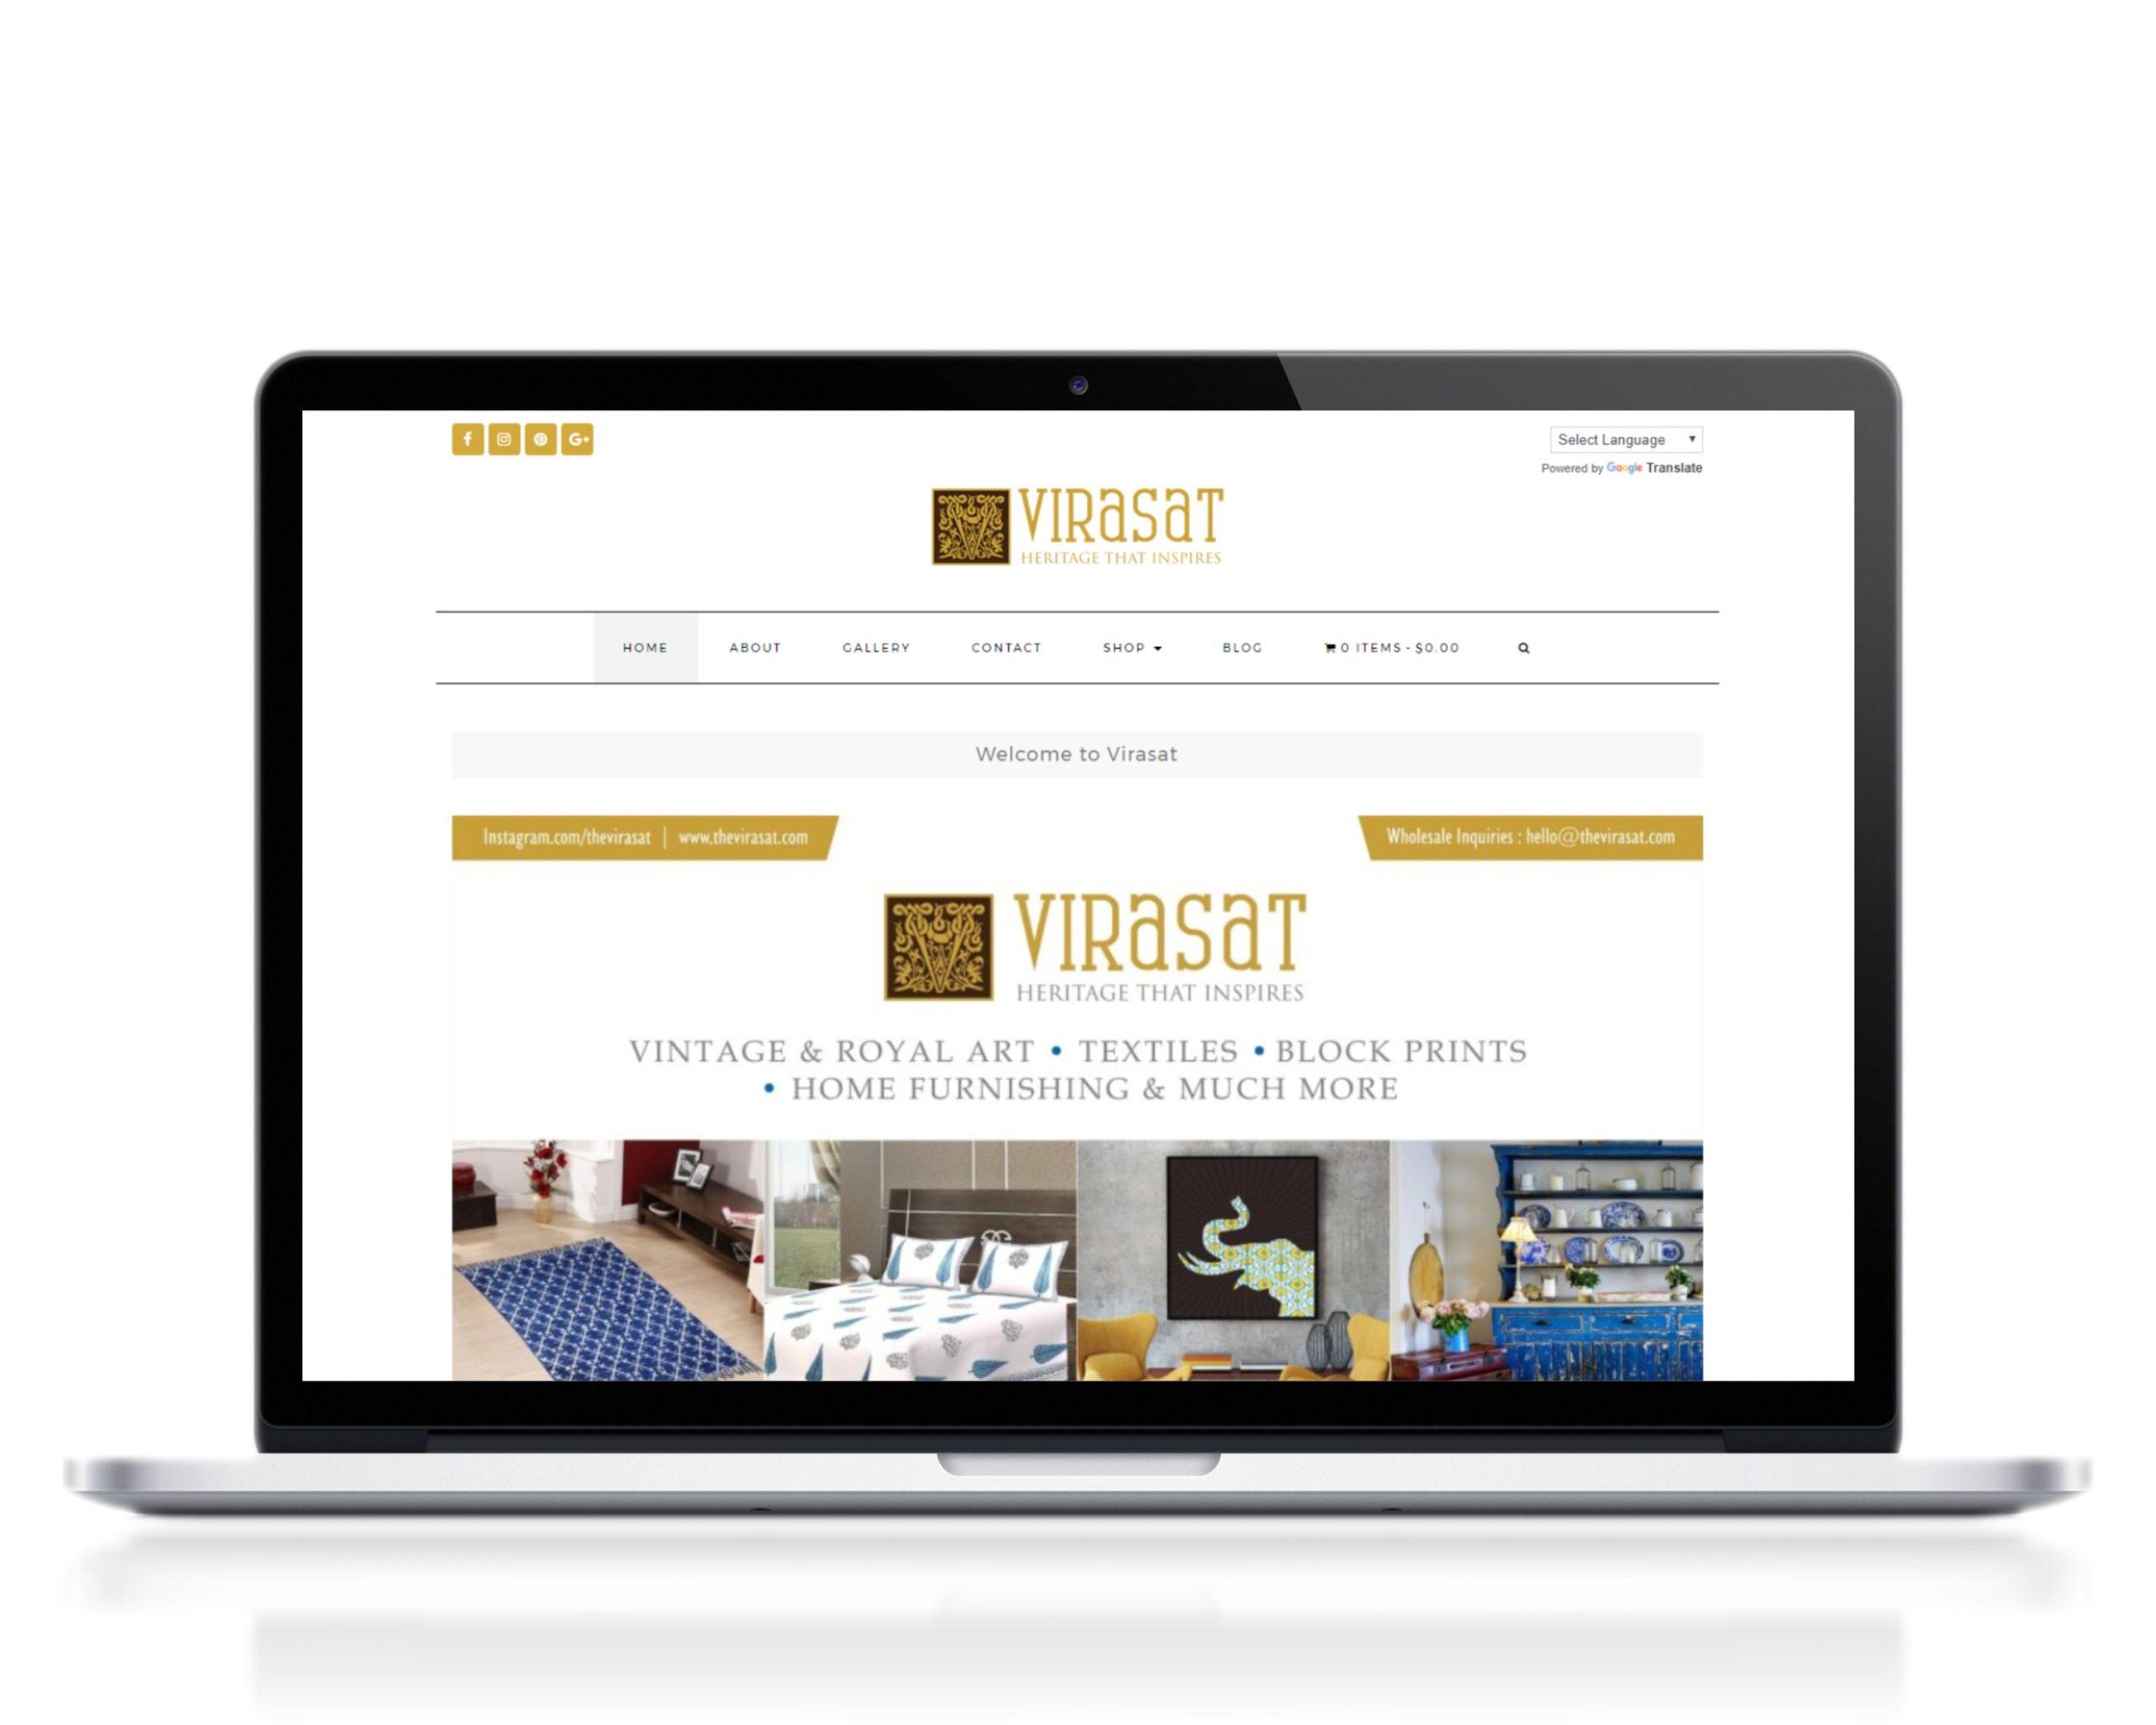 virasat website